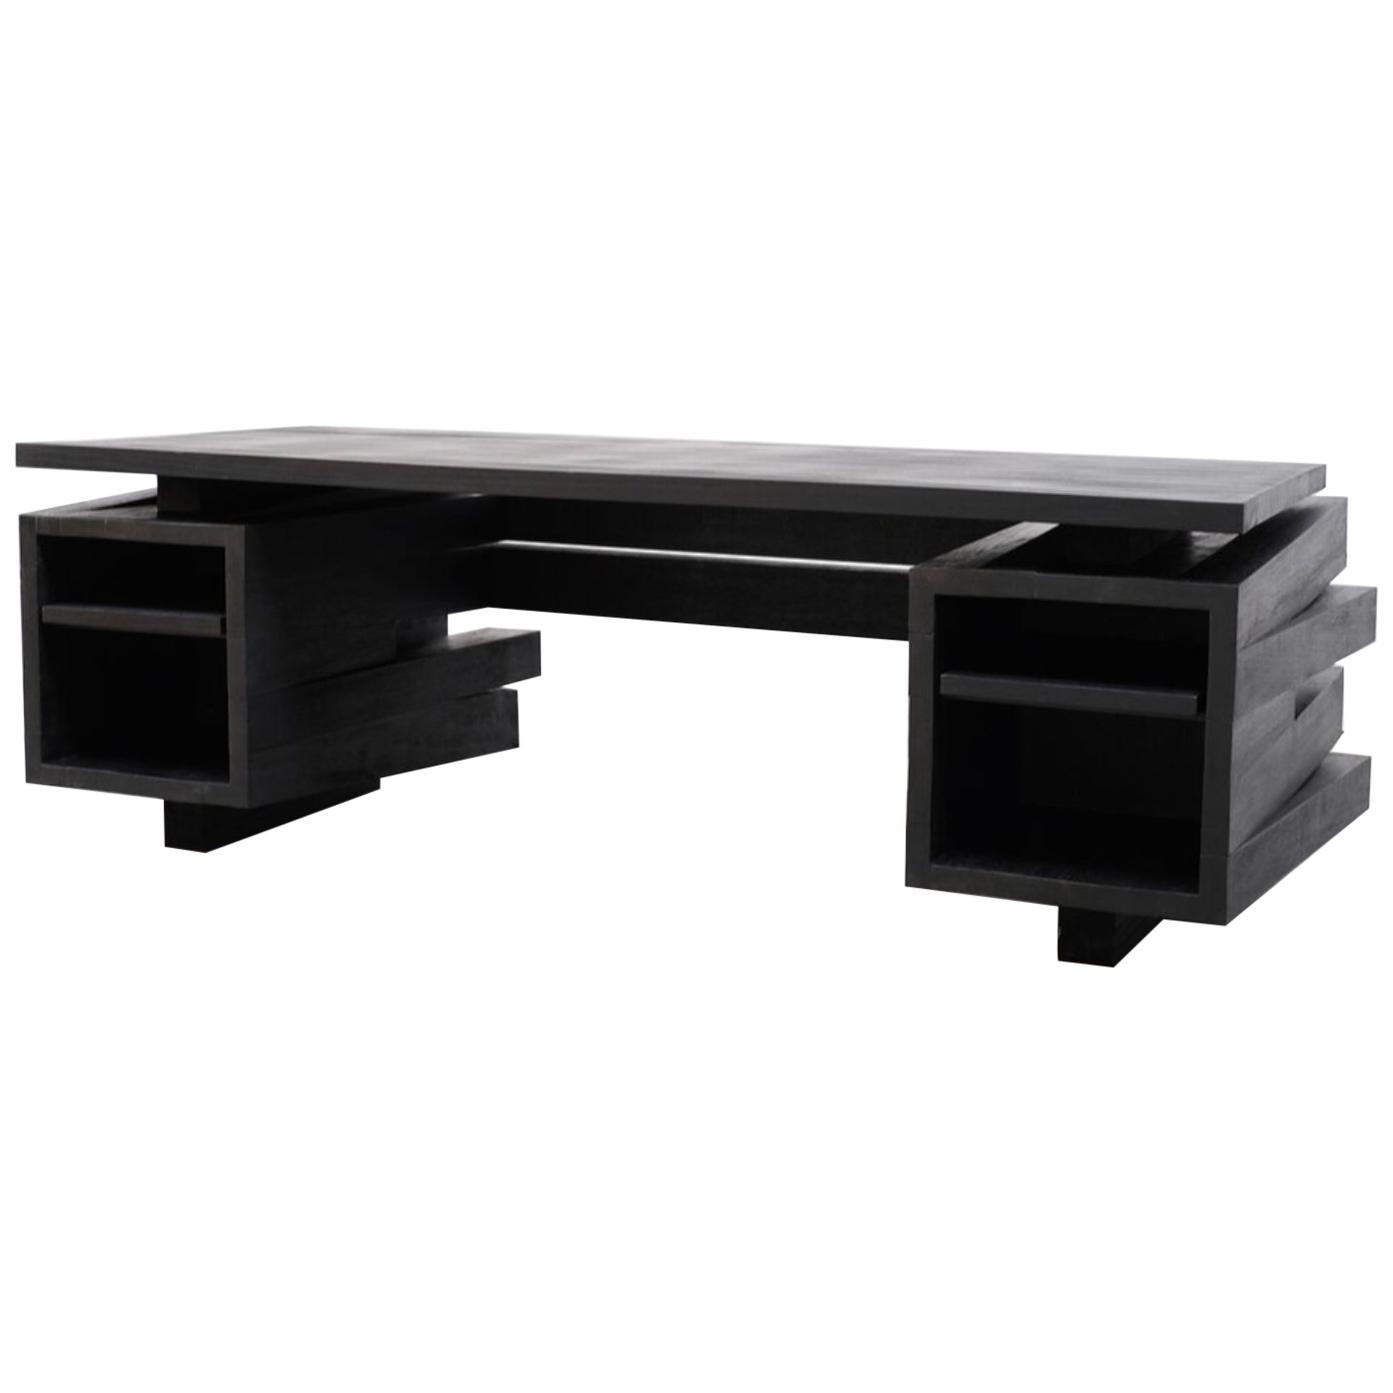 Desk in Iroko Wood by Arno Declercq